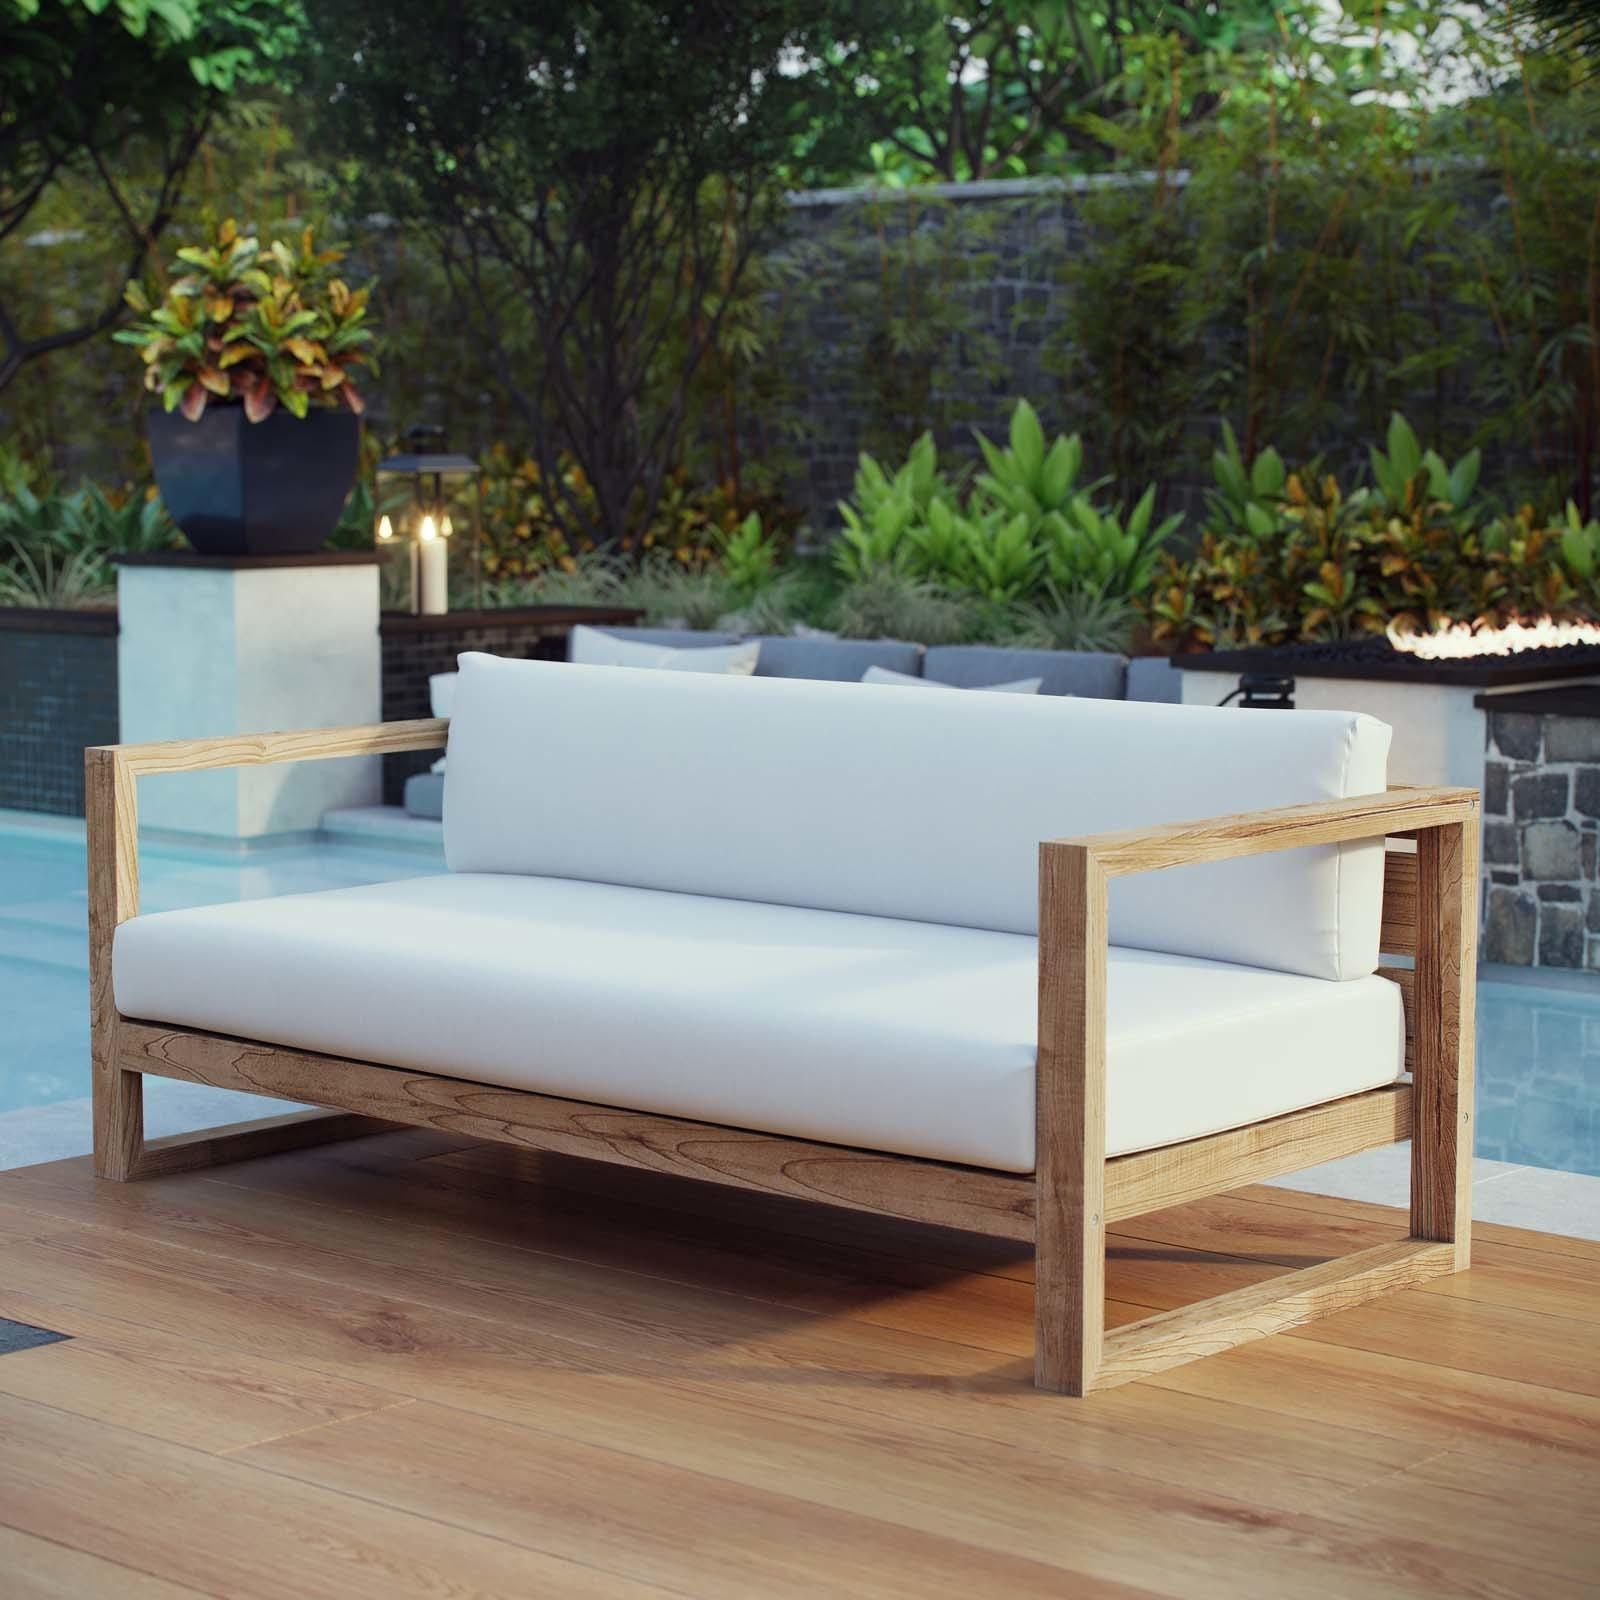 Shop Upland Outdoor Patio Teak Sofa - Free Shipping Today ...